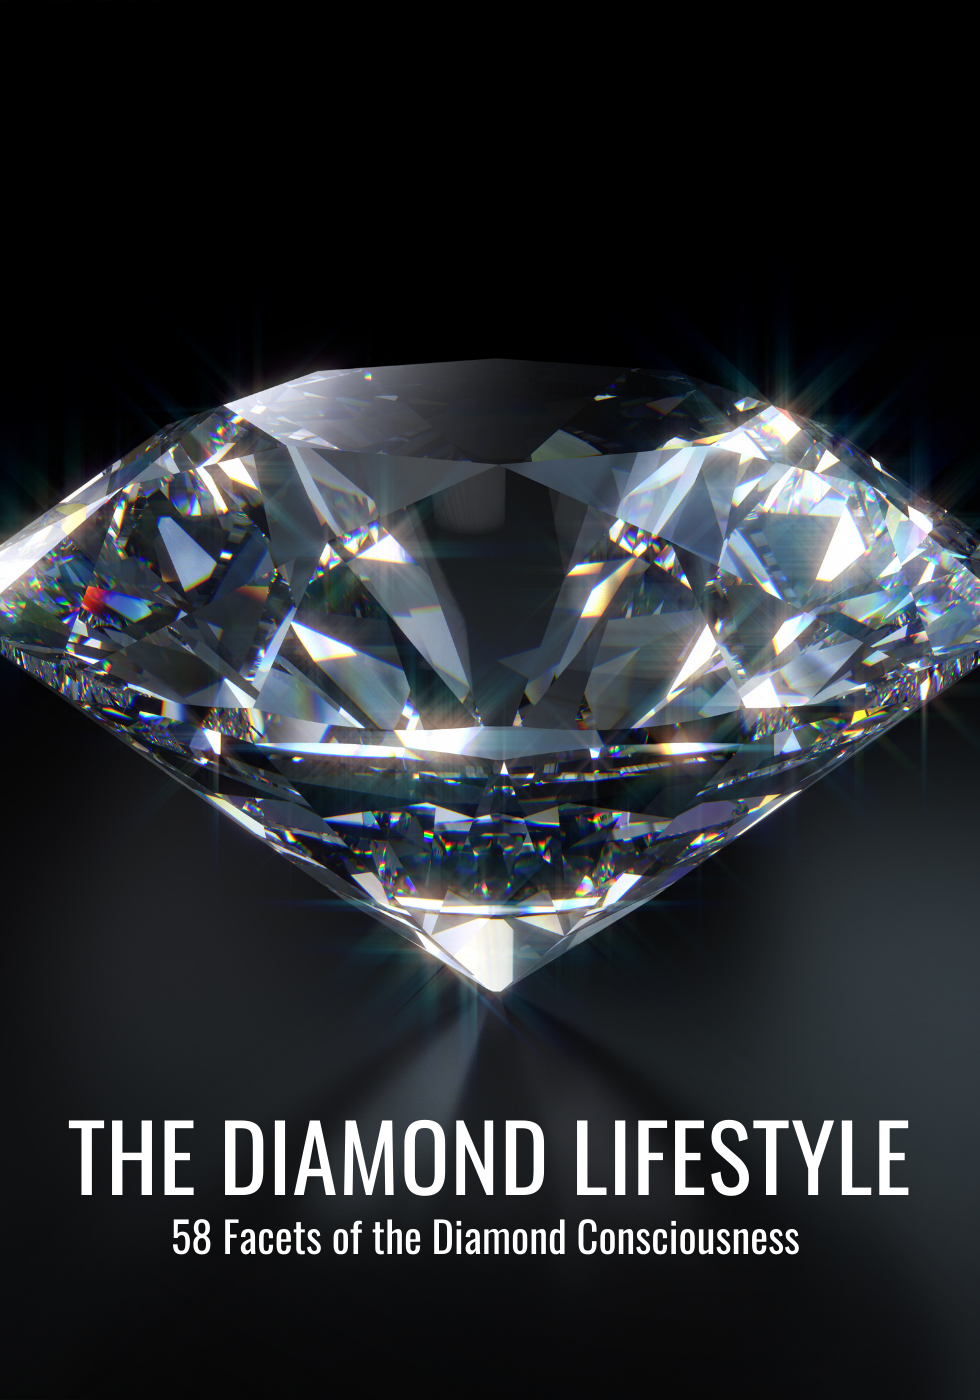 DIANA ESTHER The Diamond Lifestyle 58 Facets of Diamond Consciousness